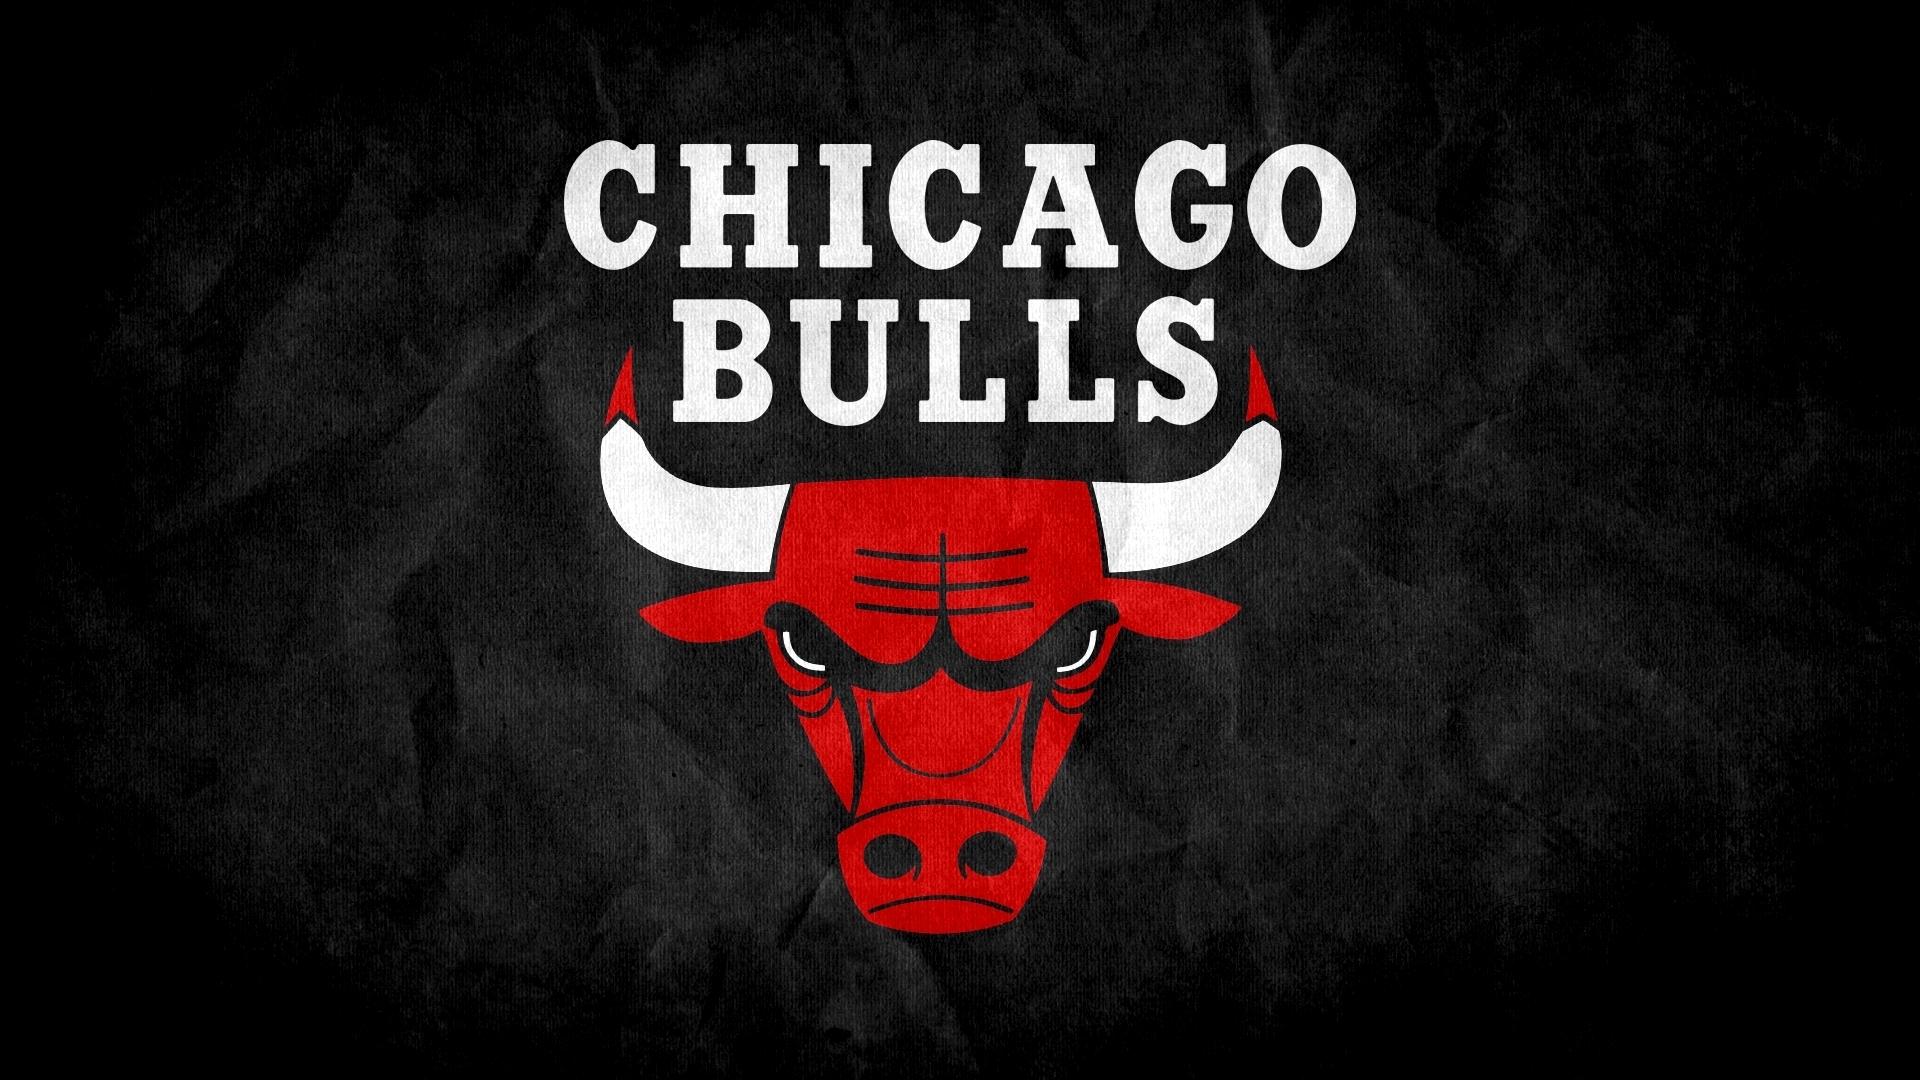 fond d'écran : chicago bulls, 2015, logo 1920x1080 - - 1001786